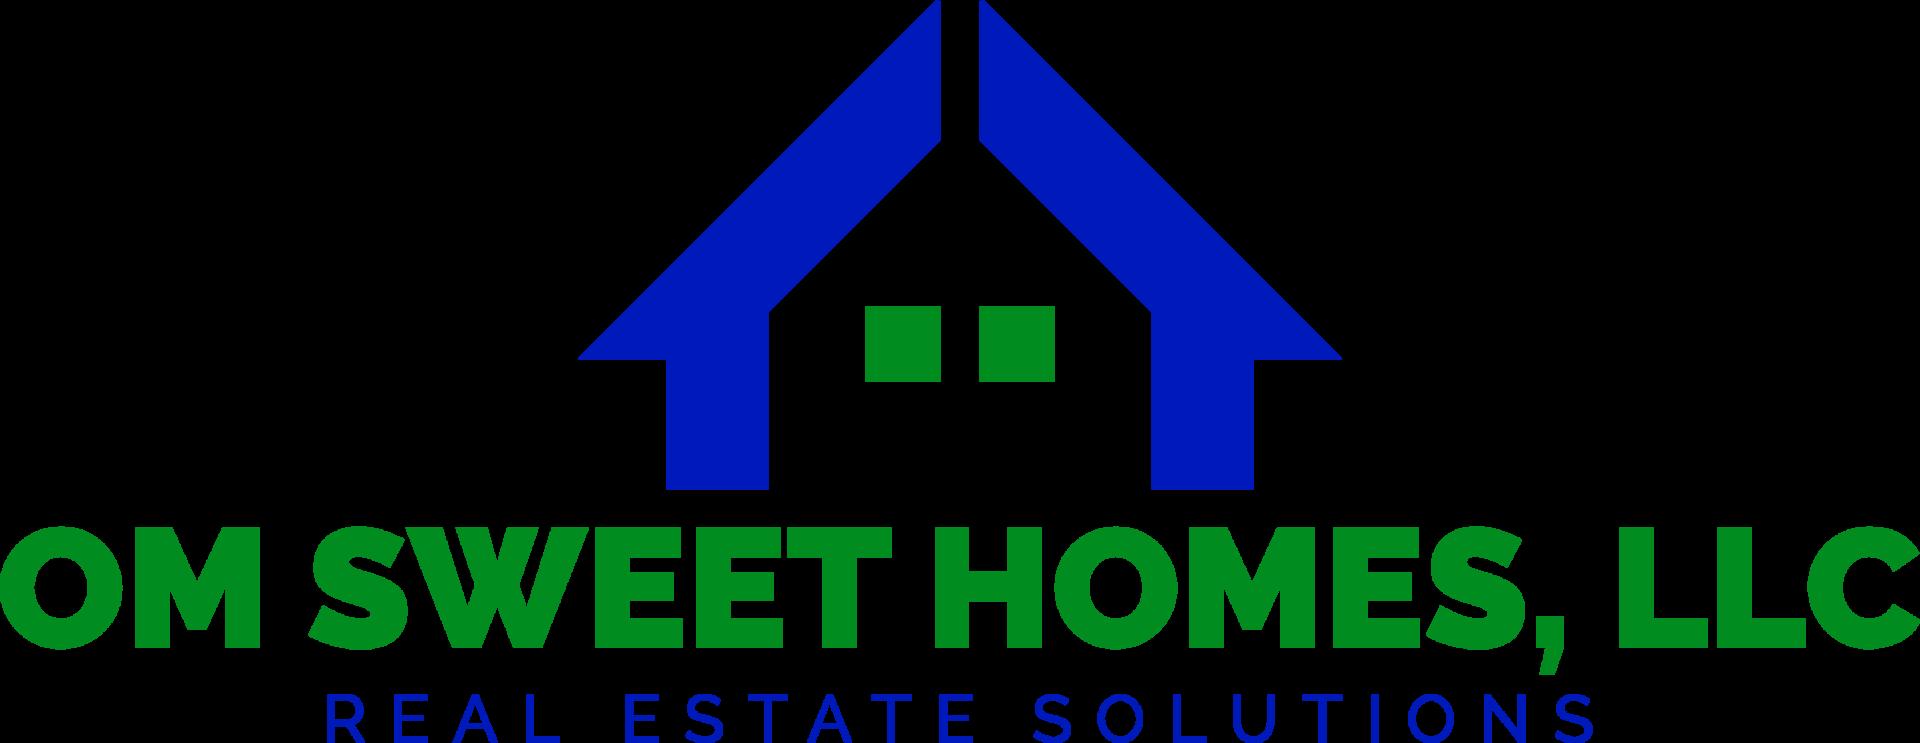 OmSweetHomesLLC.com logo